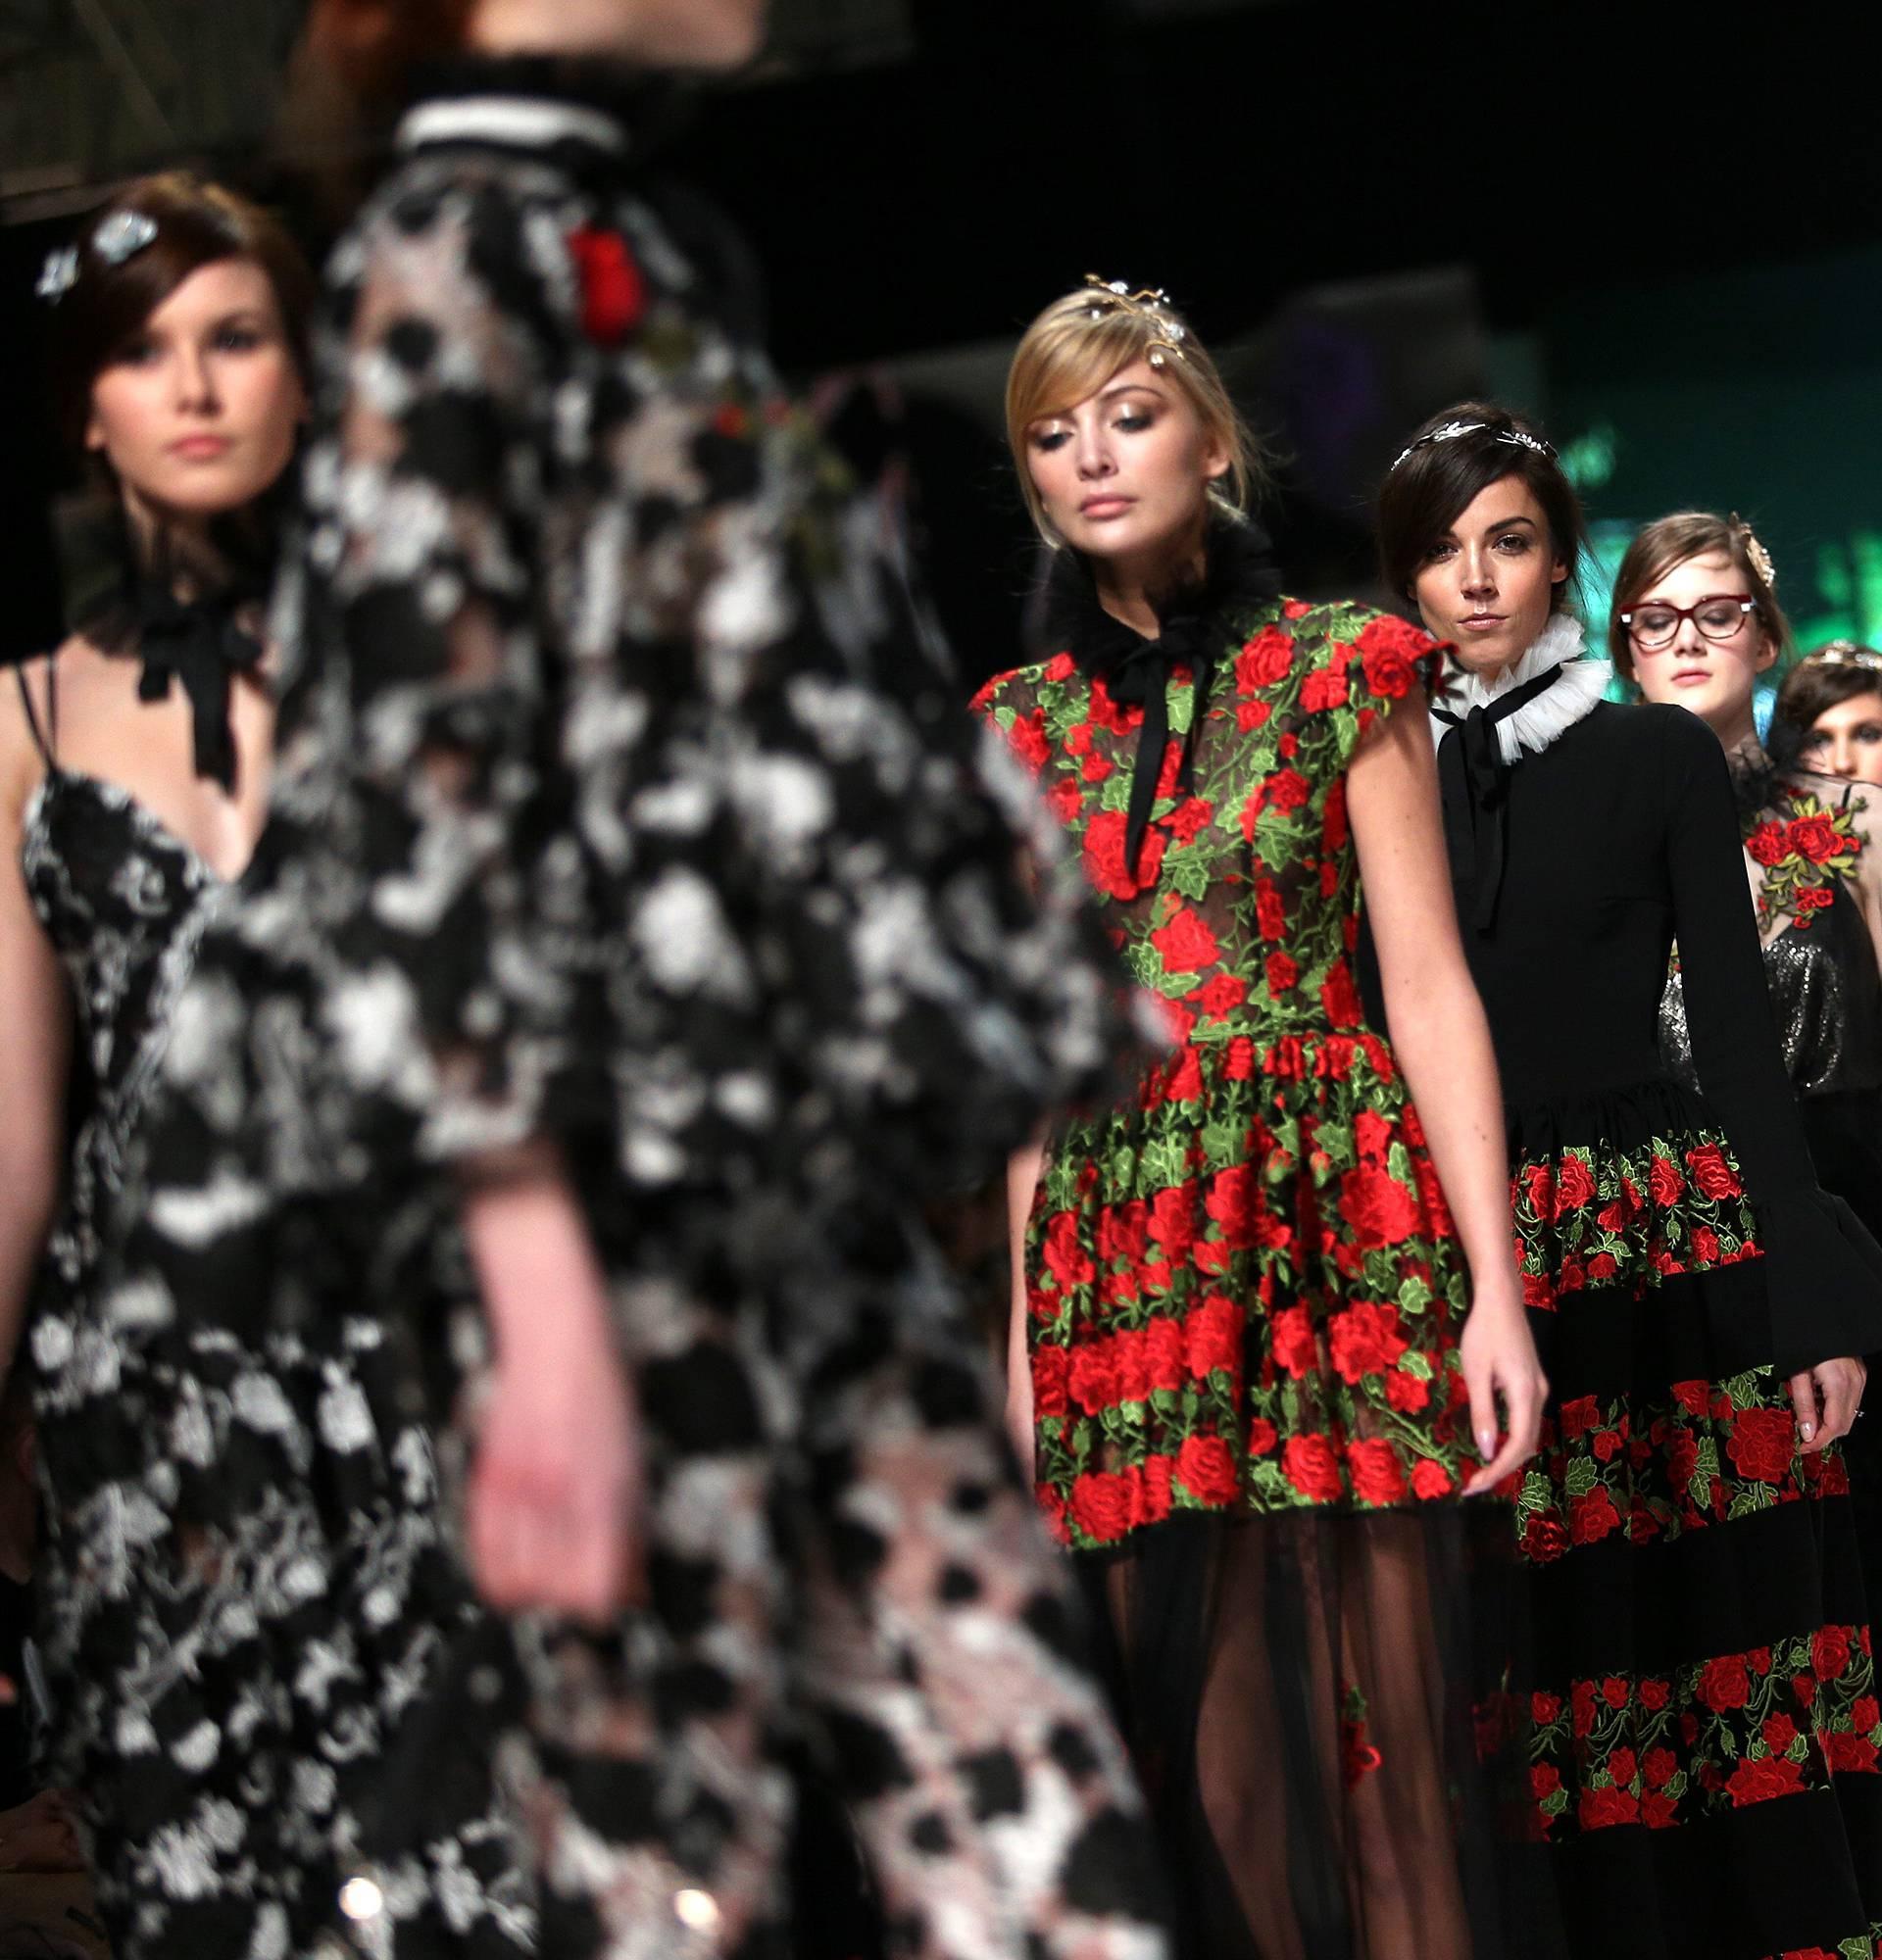 Bajkovito, a izazovno: eNVy room otvorili Bipa fashion.hr